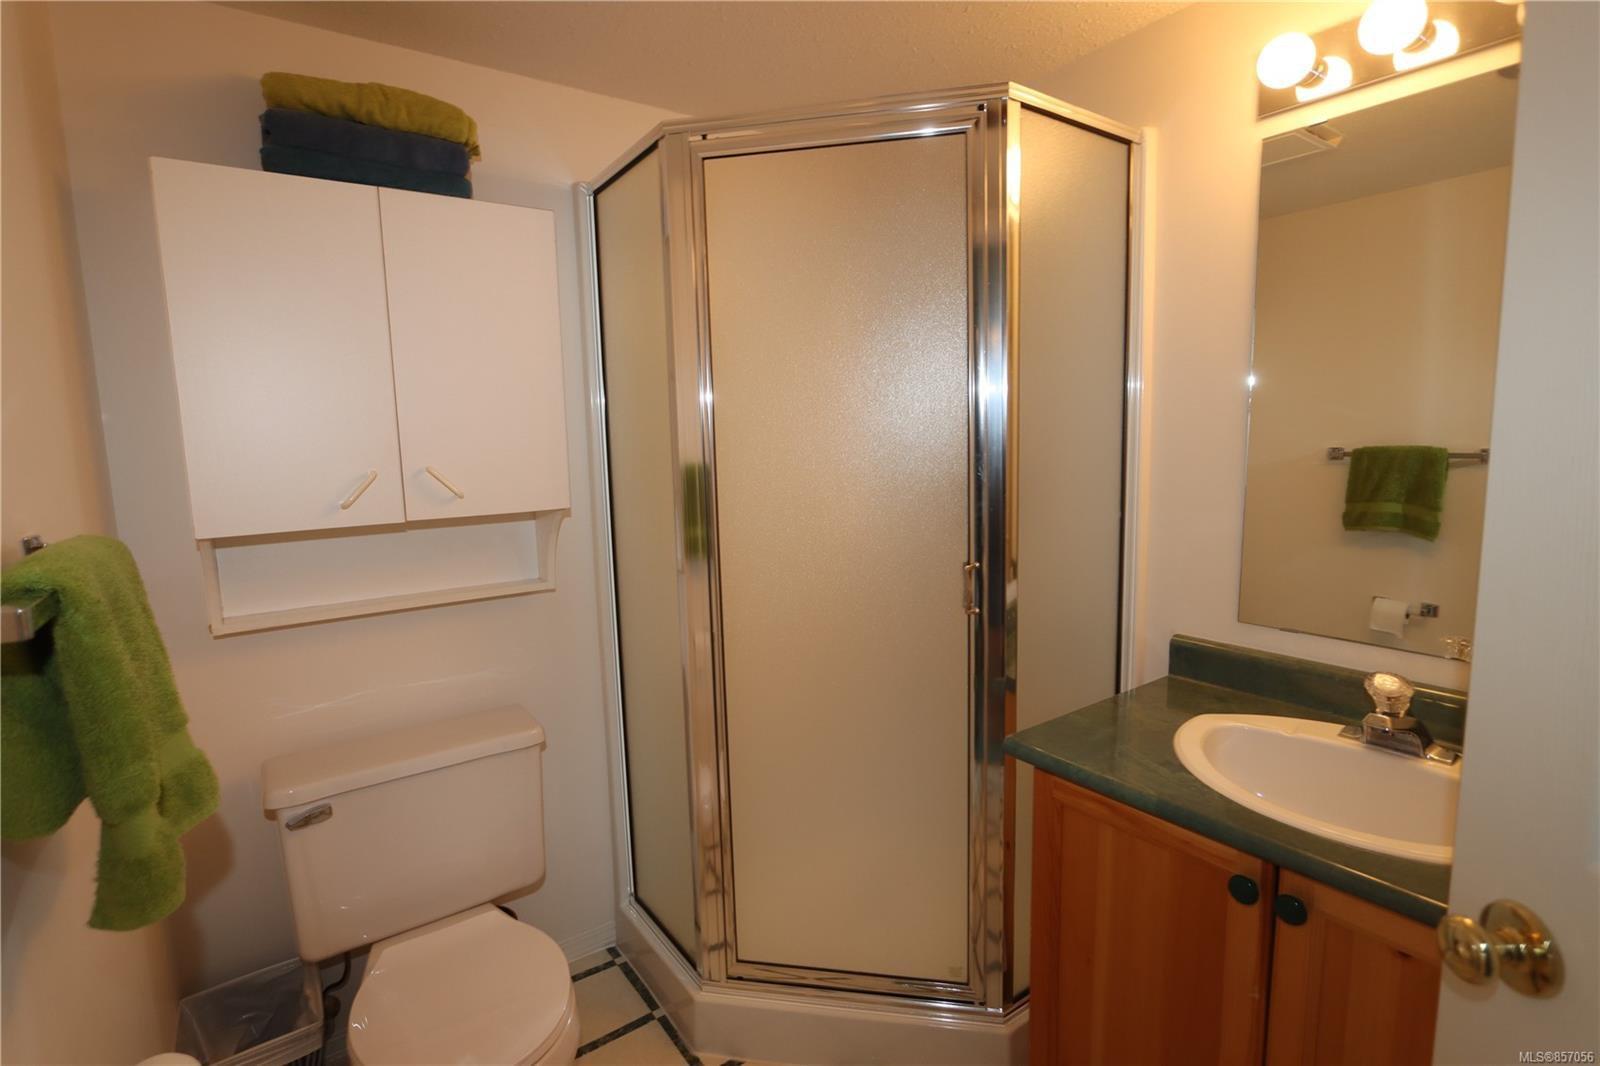 Photo 11: Photos: 118 1320 Henry Rd in : CV Mt Washington Condo for sale (Comox Valley)  : MLS®# 857056